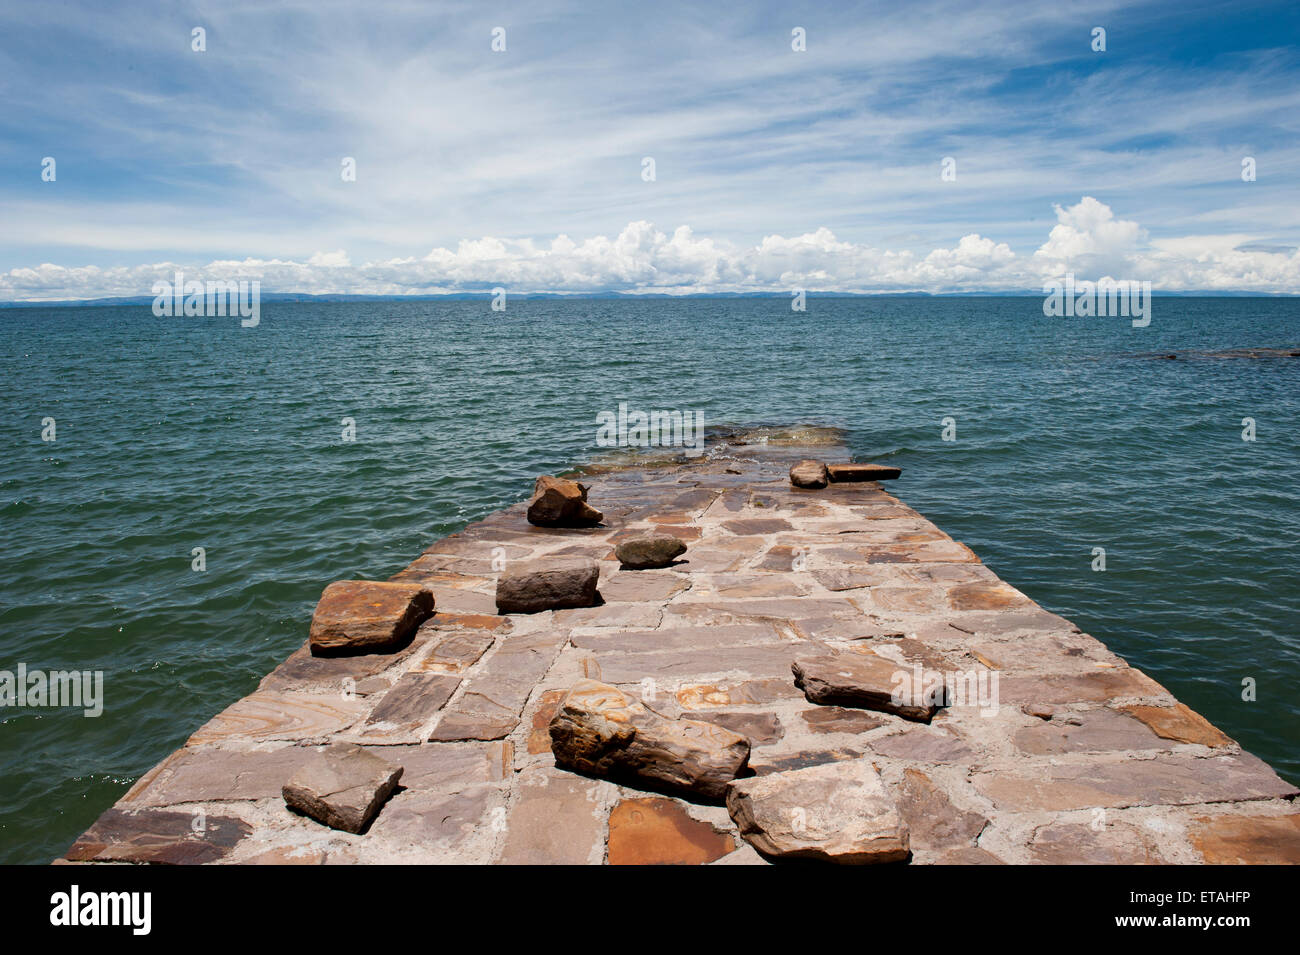 Bolivia View - Stock Image